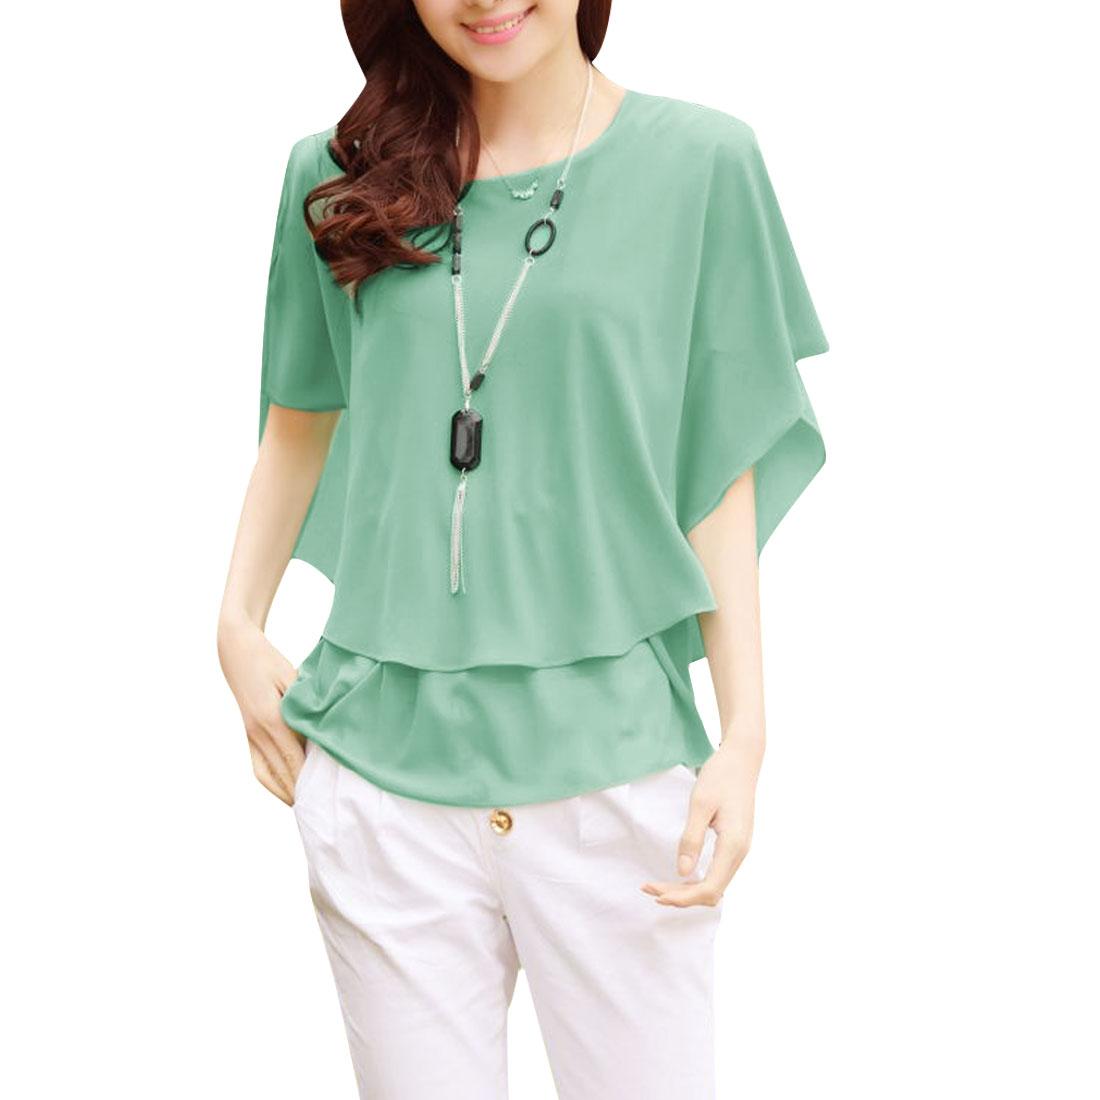 Women Round Neck Chiffon Short-sleeved Loose Flare Shirt Light Green S